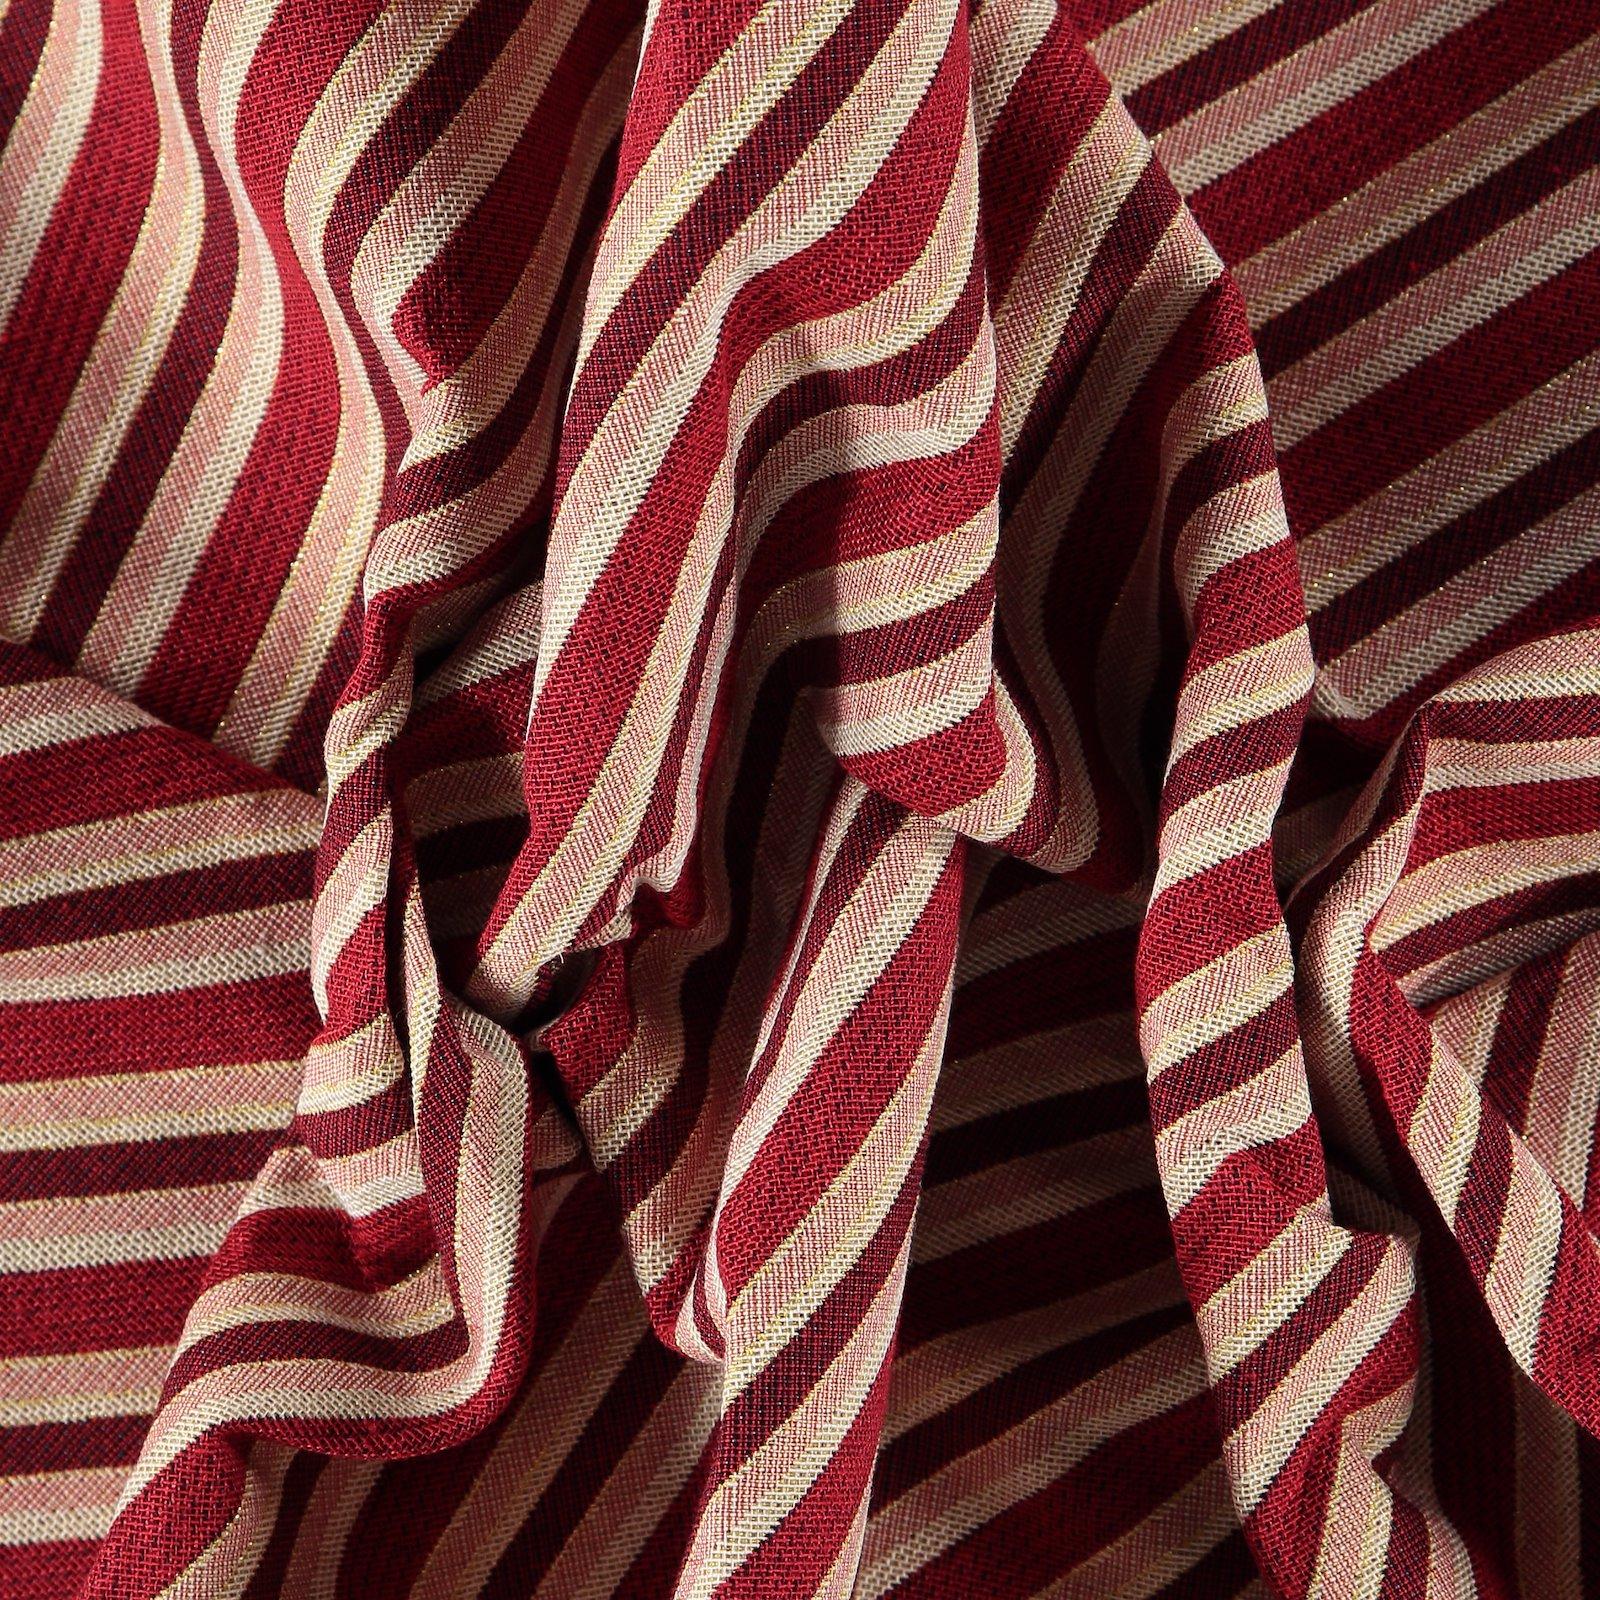 Gobelin nature/red/gold diagonal stripe